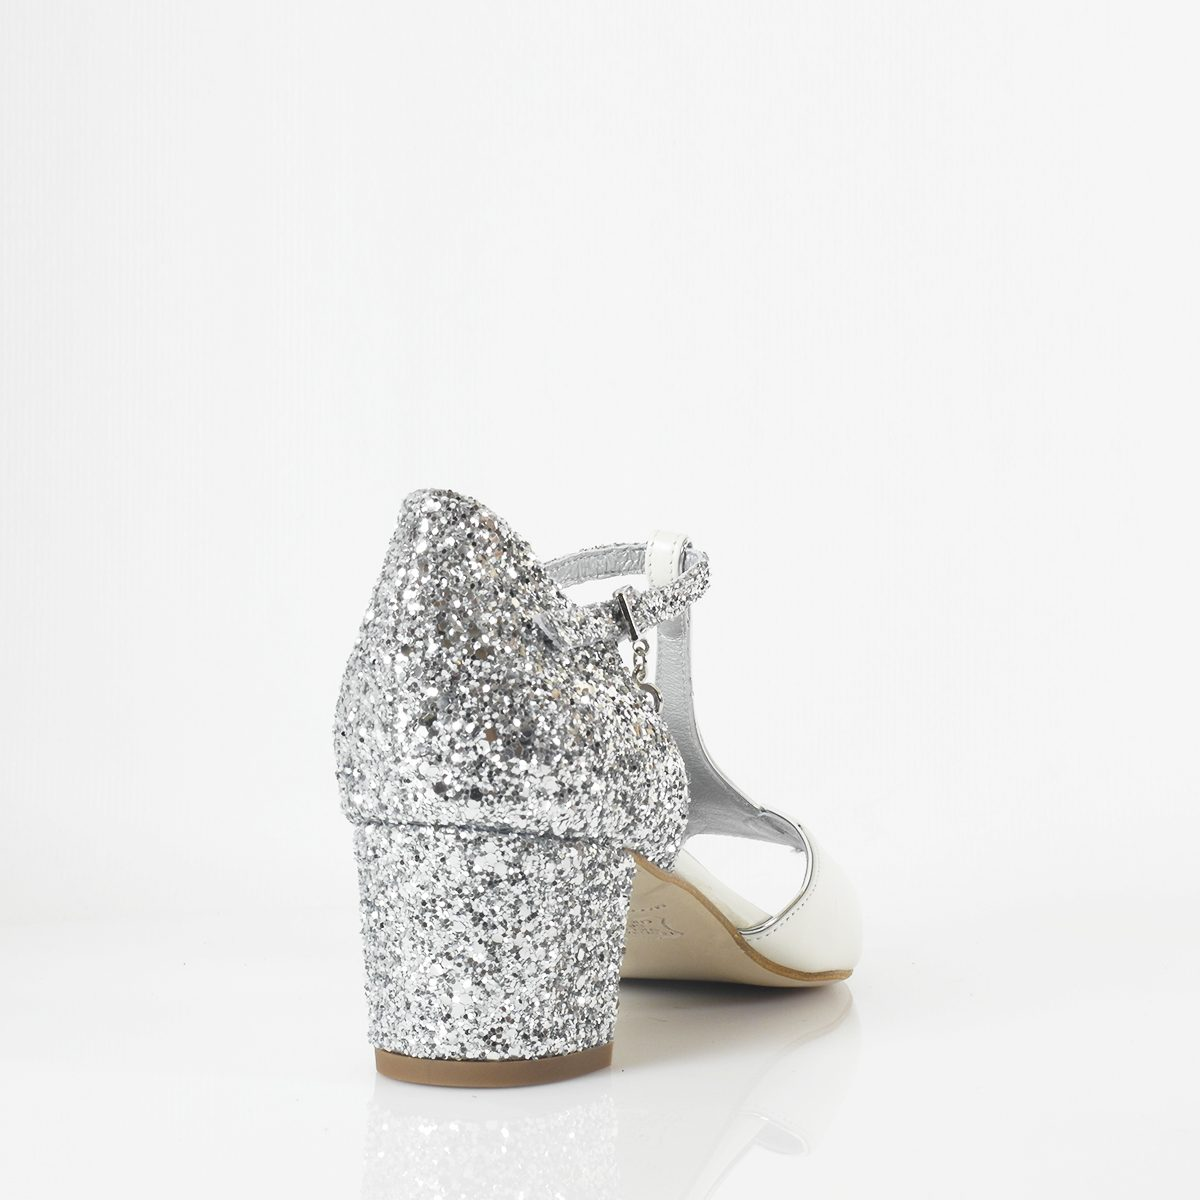 SANDALIA MOD.1960 (4cm) - Zapatos Personalizados Fiesta